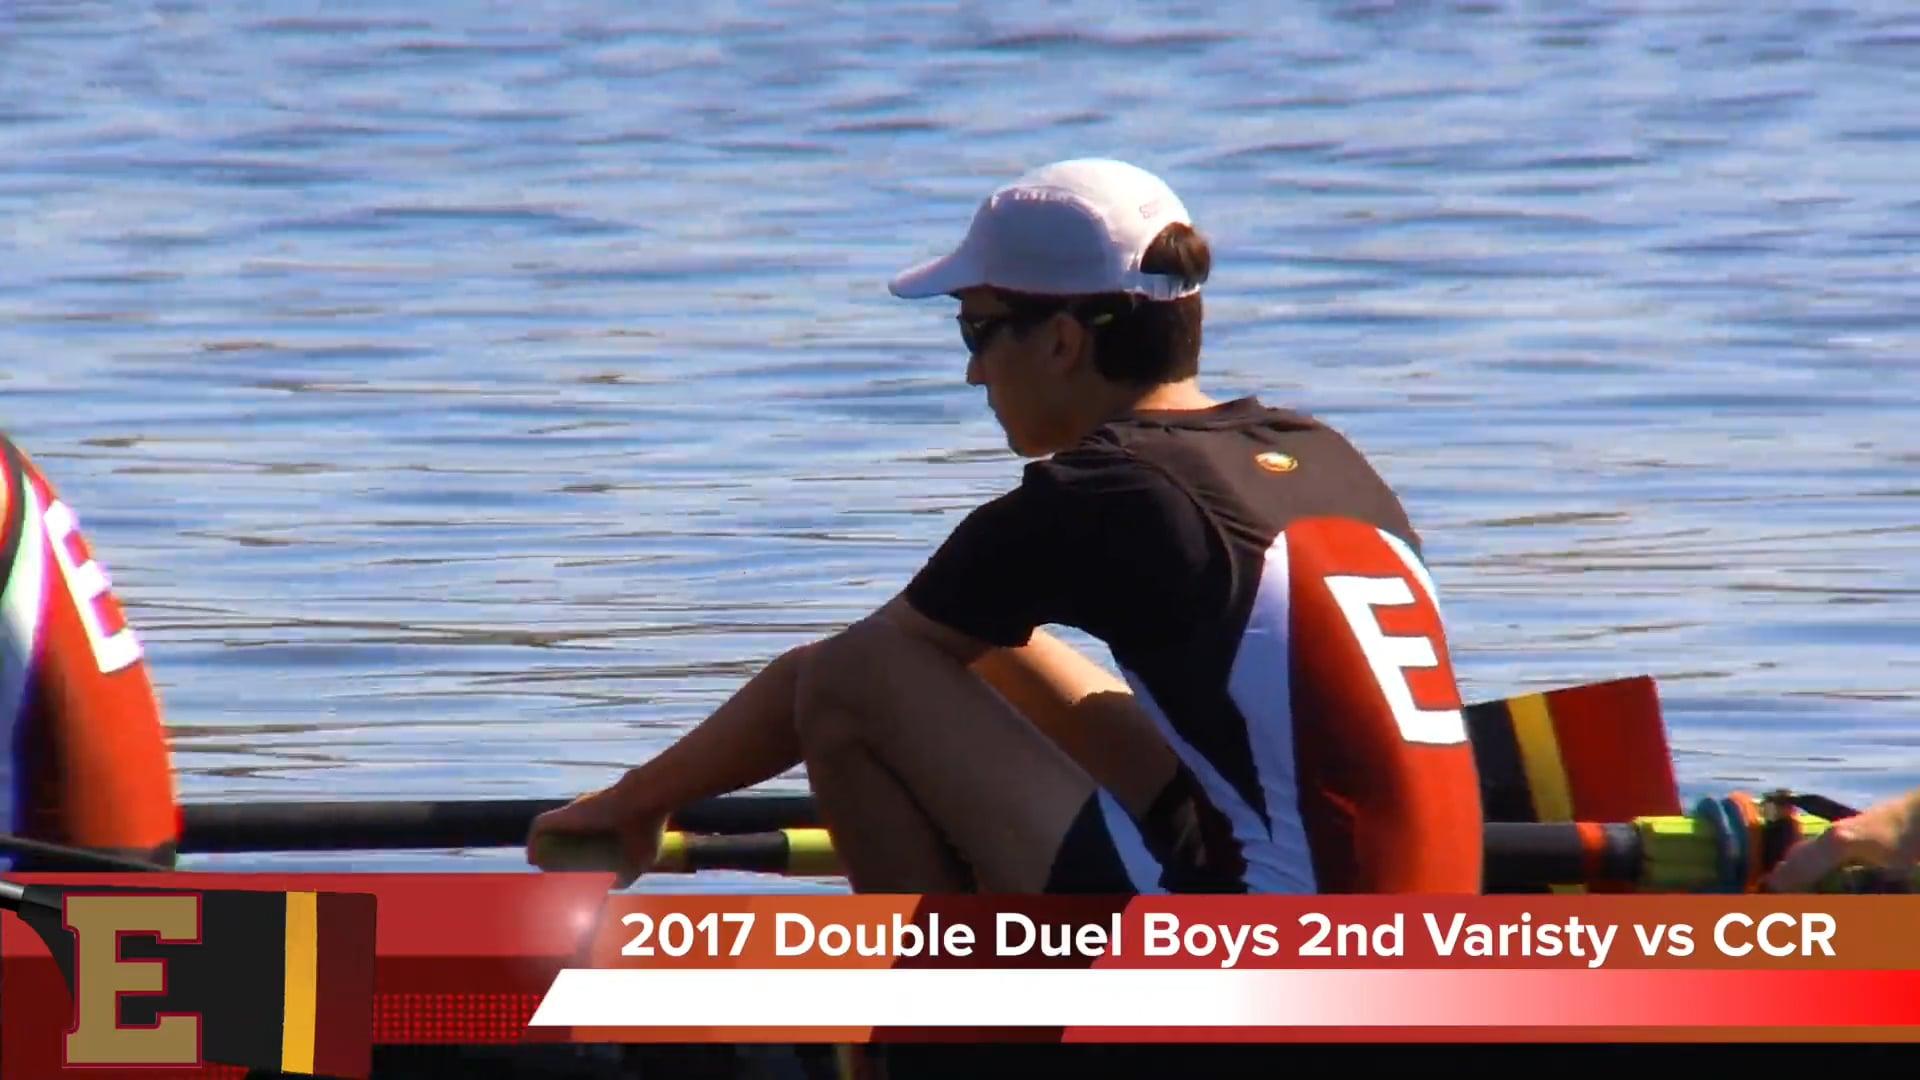 Boys 2nd Varsity 2017 Double Duel Jacksonville Episcopal vs Capital City Rowing